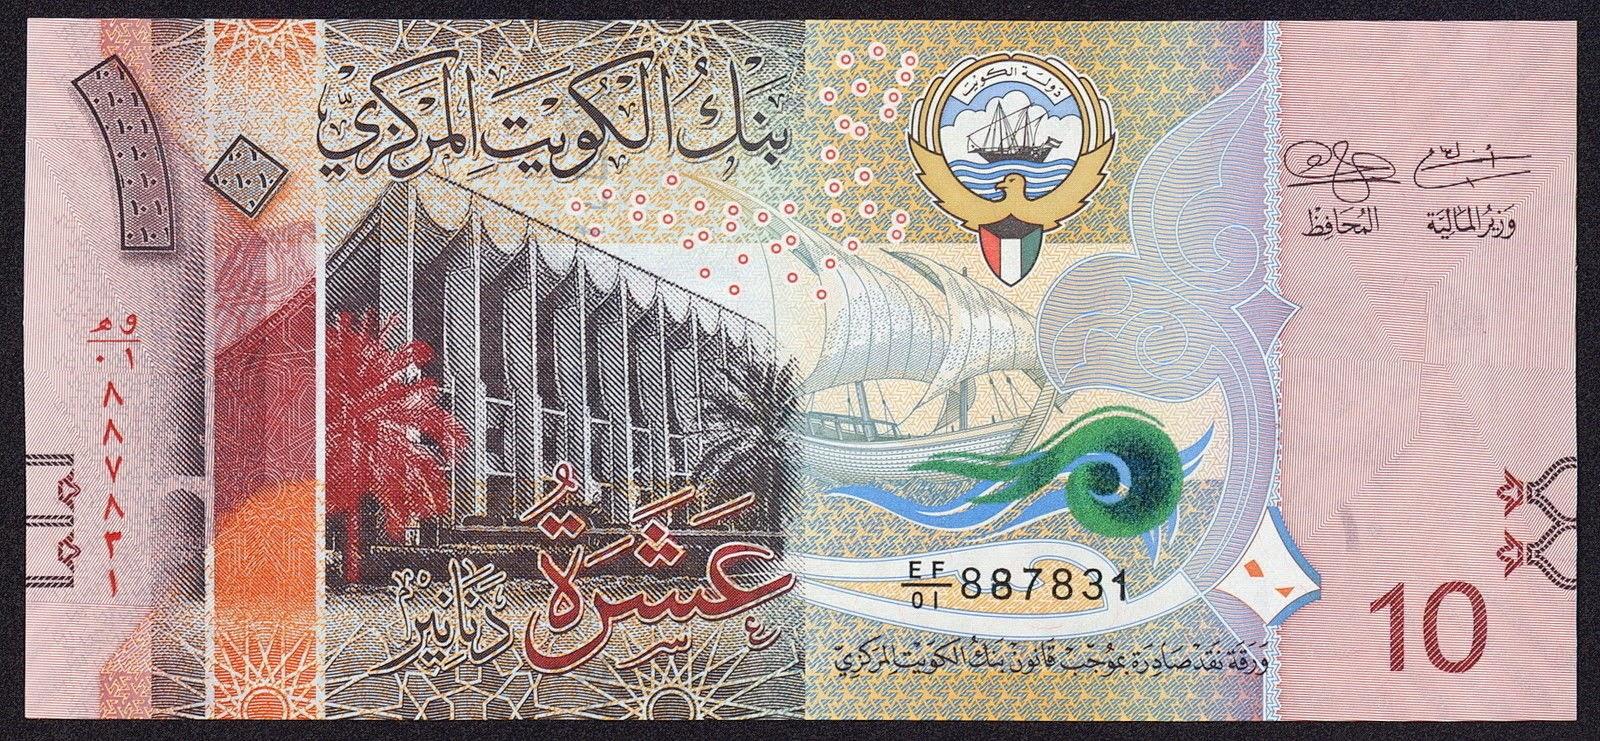 Kuwait New Banknotes 10 Dinars bank note 2014